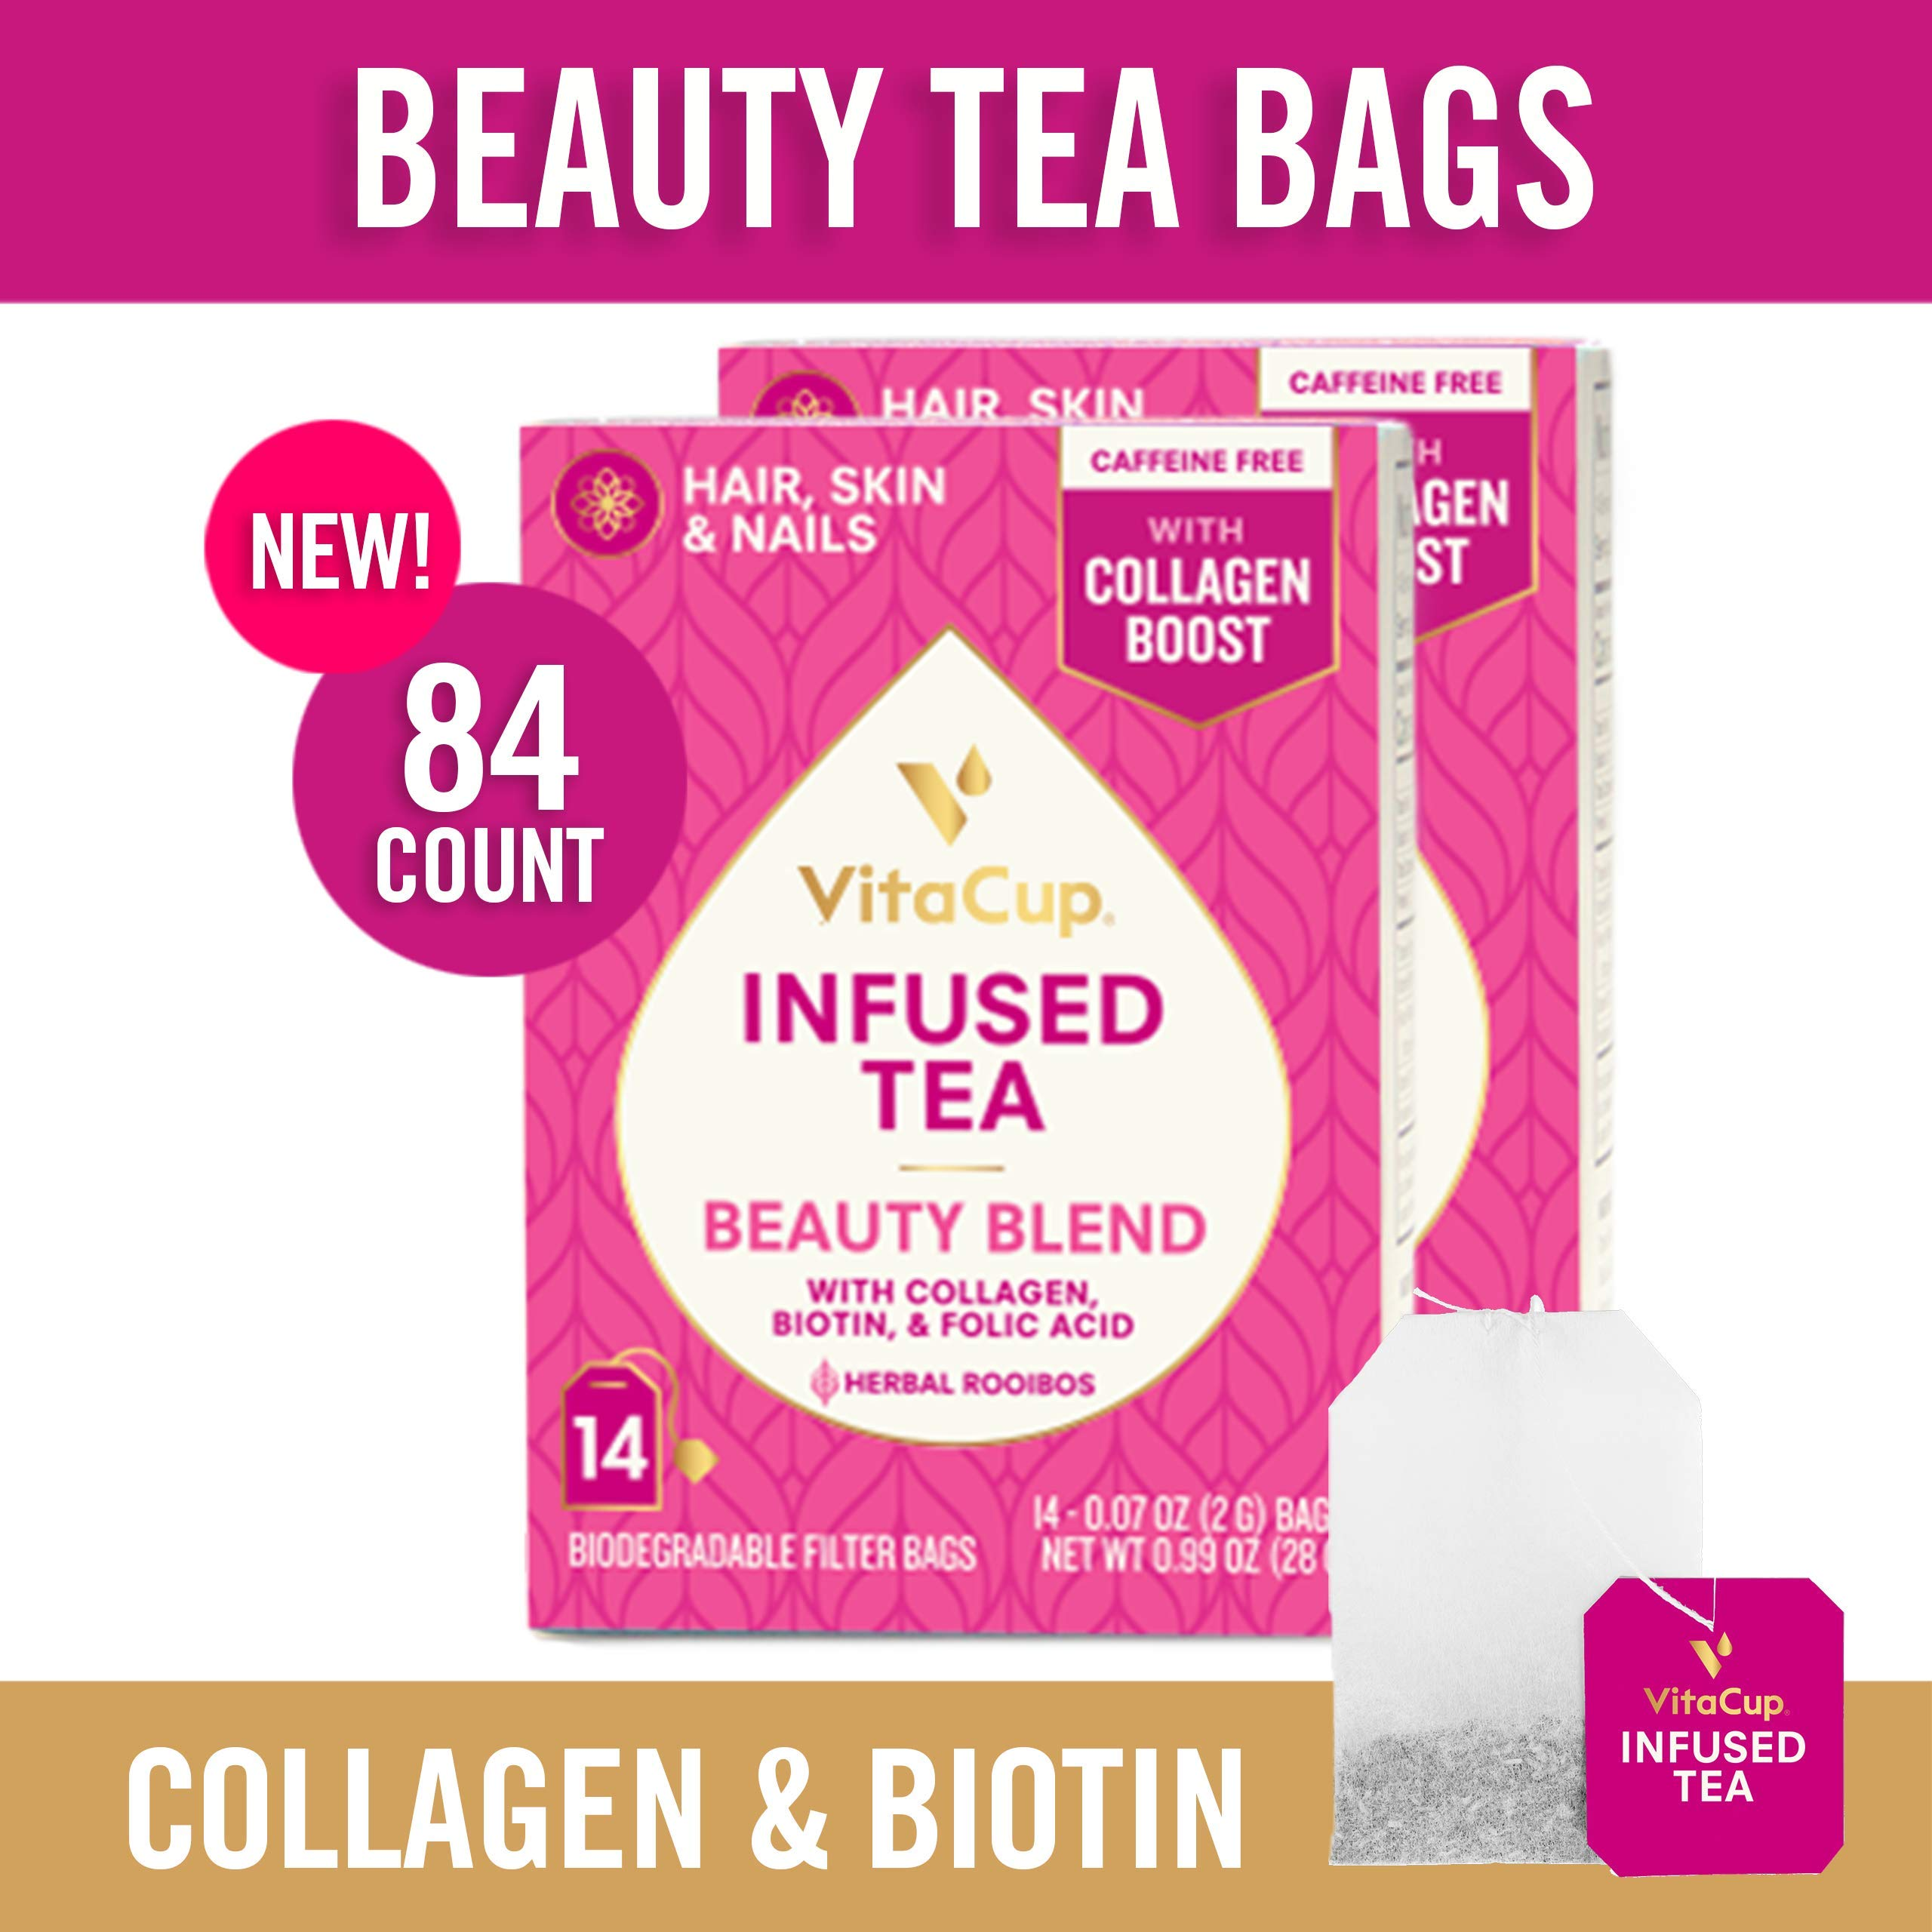 VitaCup Beauty Blend Infused Tea 84 ct |Keto|Paleo|Whole30| Jasmine Herbal Rooibos Caffeine Free Tea with Collagen Types I & III, Biotin (B7) & Folic Acid (B9) Helps Support Healthy Hair, Skin & Nails